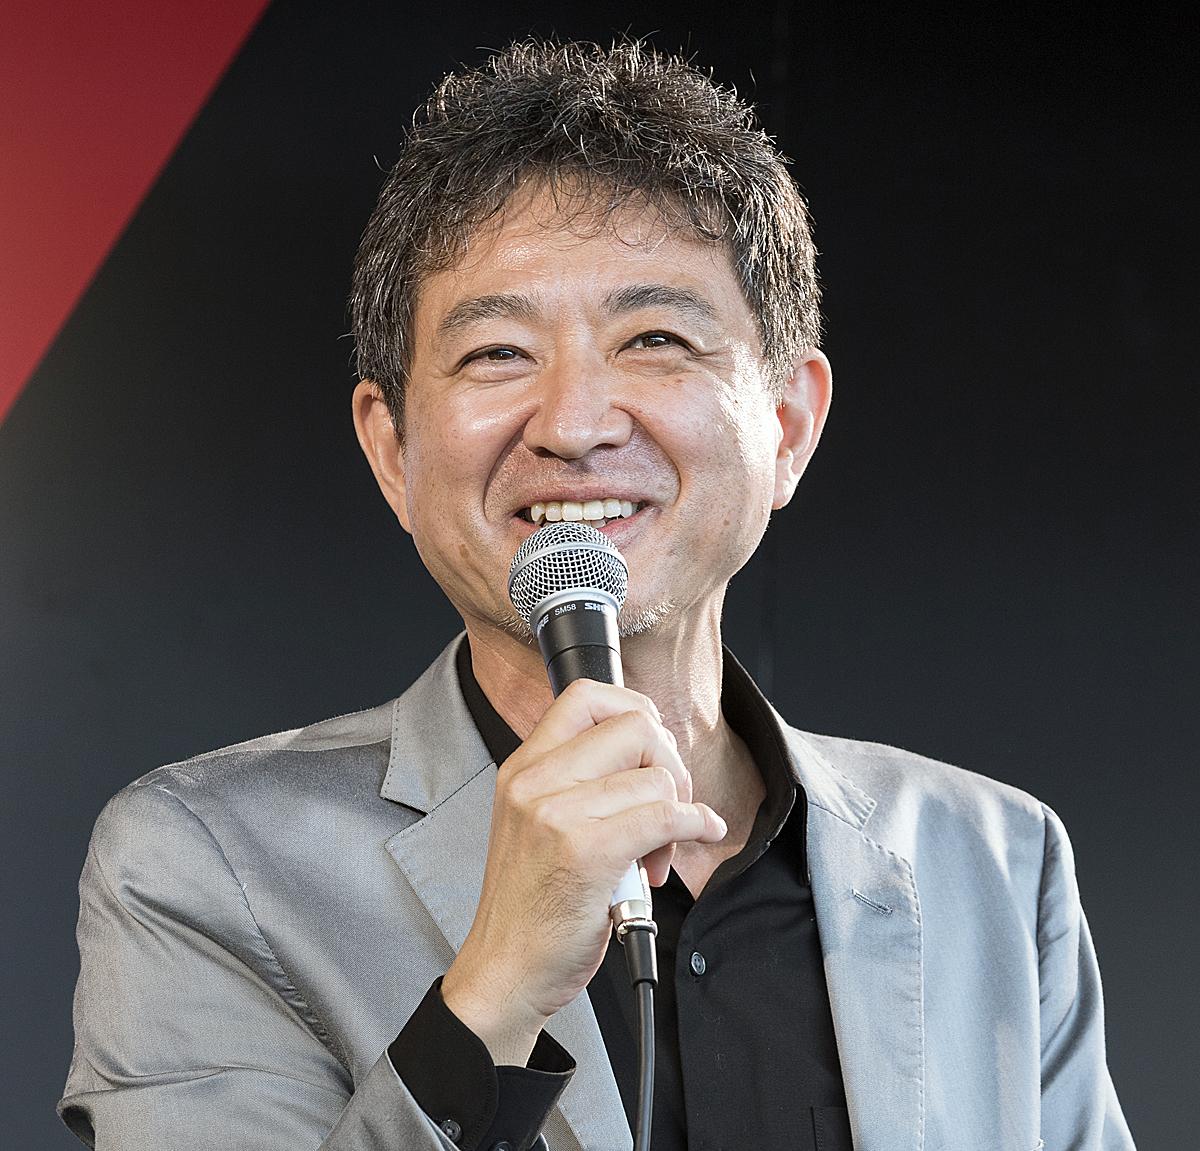 R'sミーティング GT-Rマガジン イベント 2017